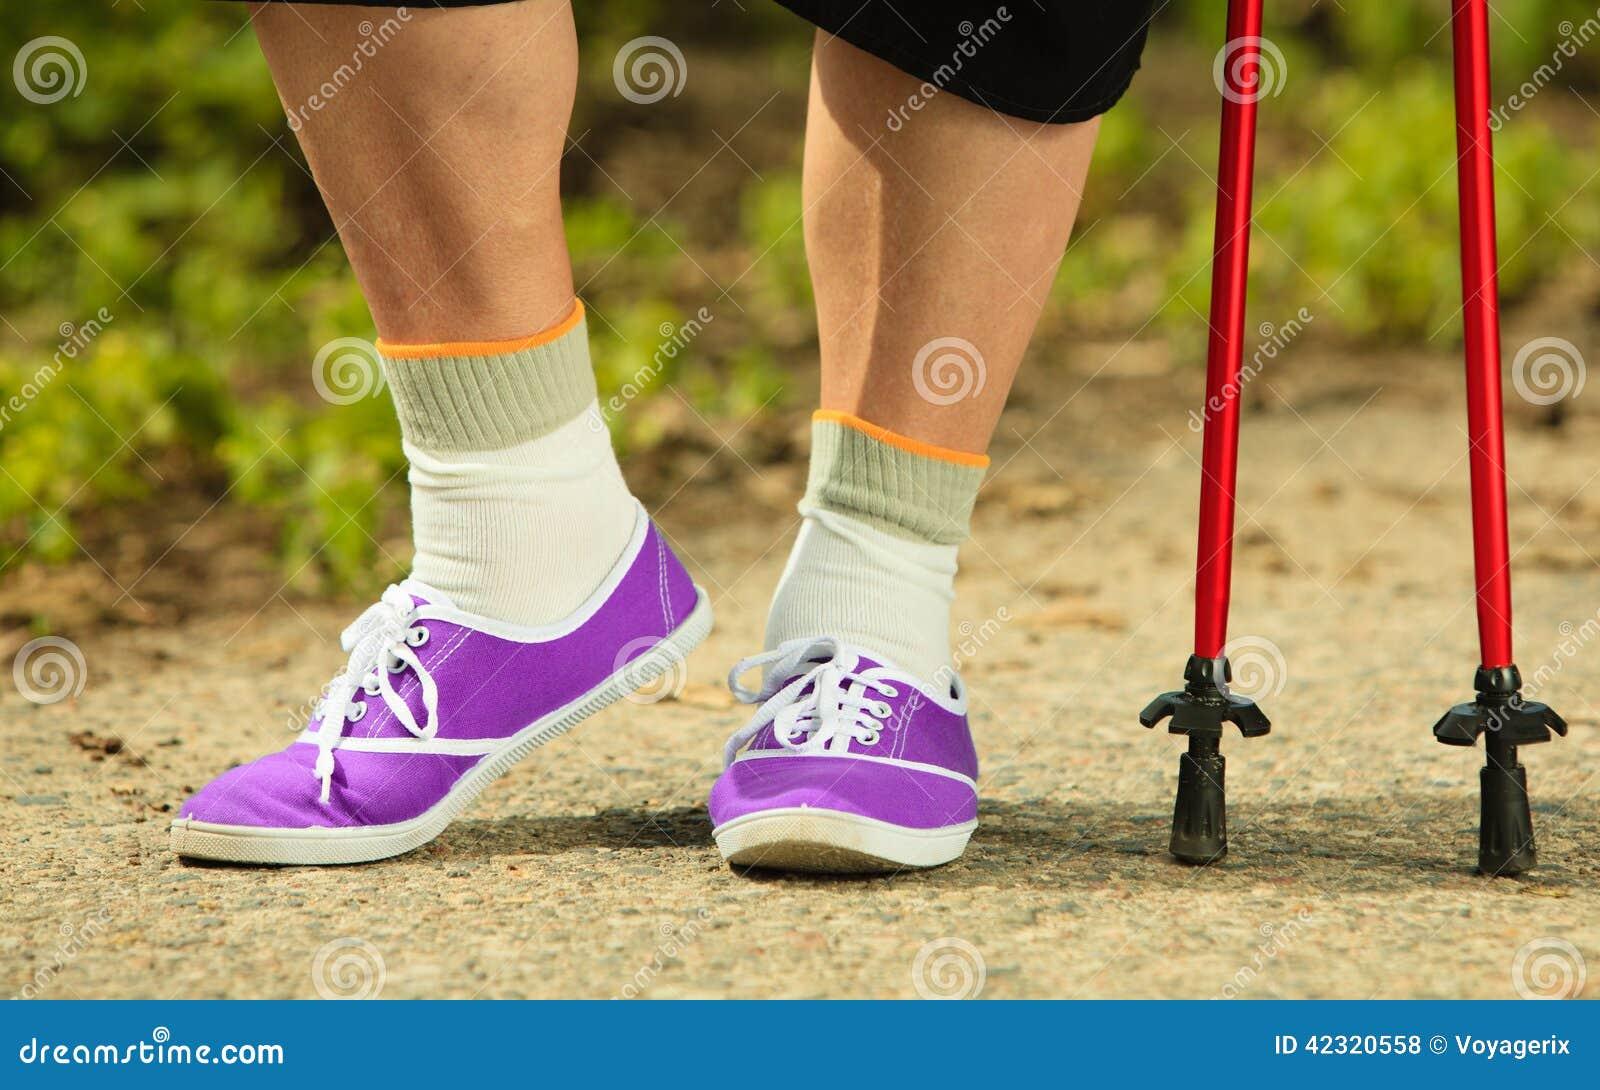 Nordic Walking Closeup Of Mature Female Legs Stock Photo - Image 42320558-5223